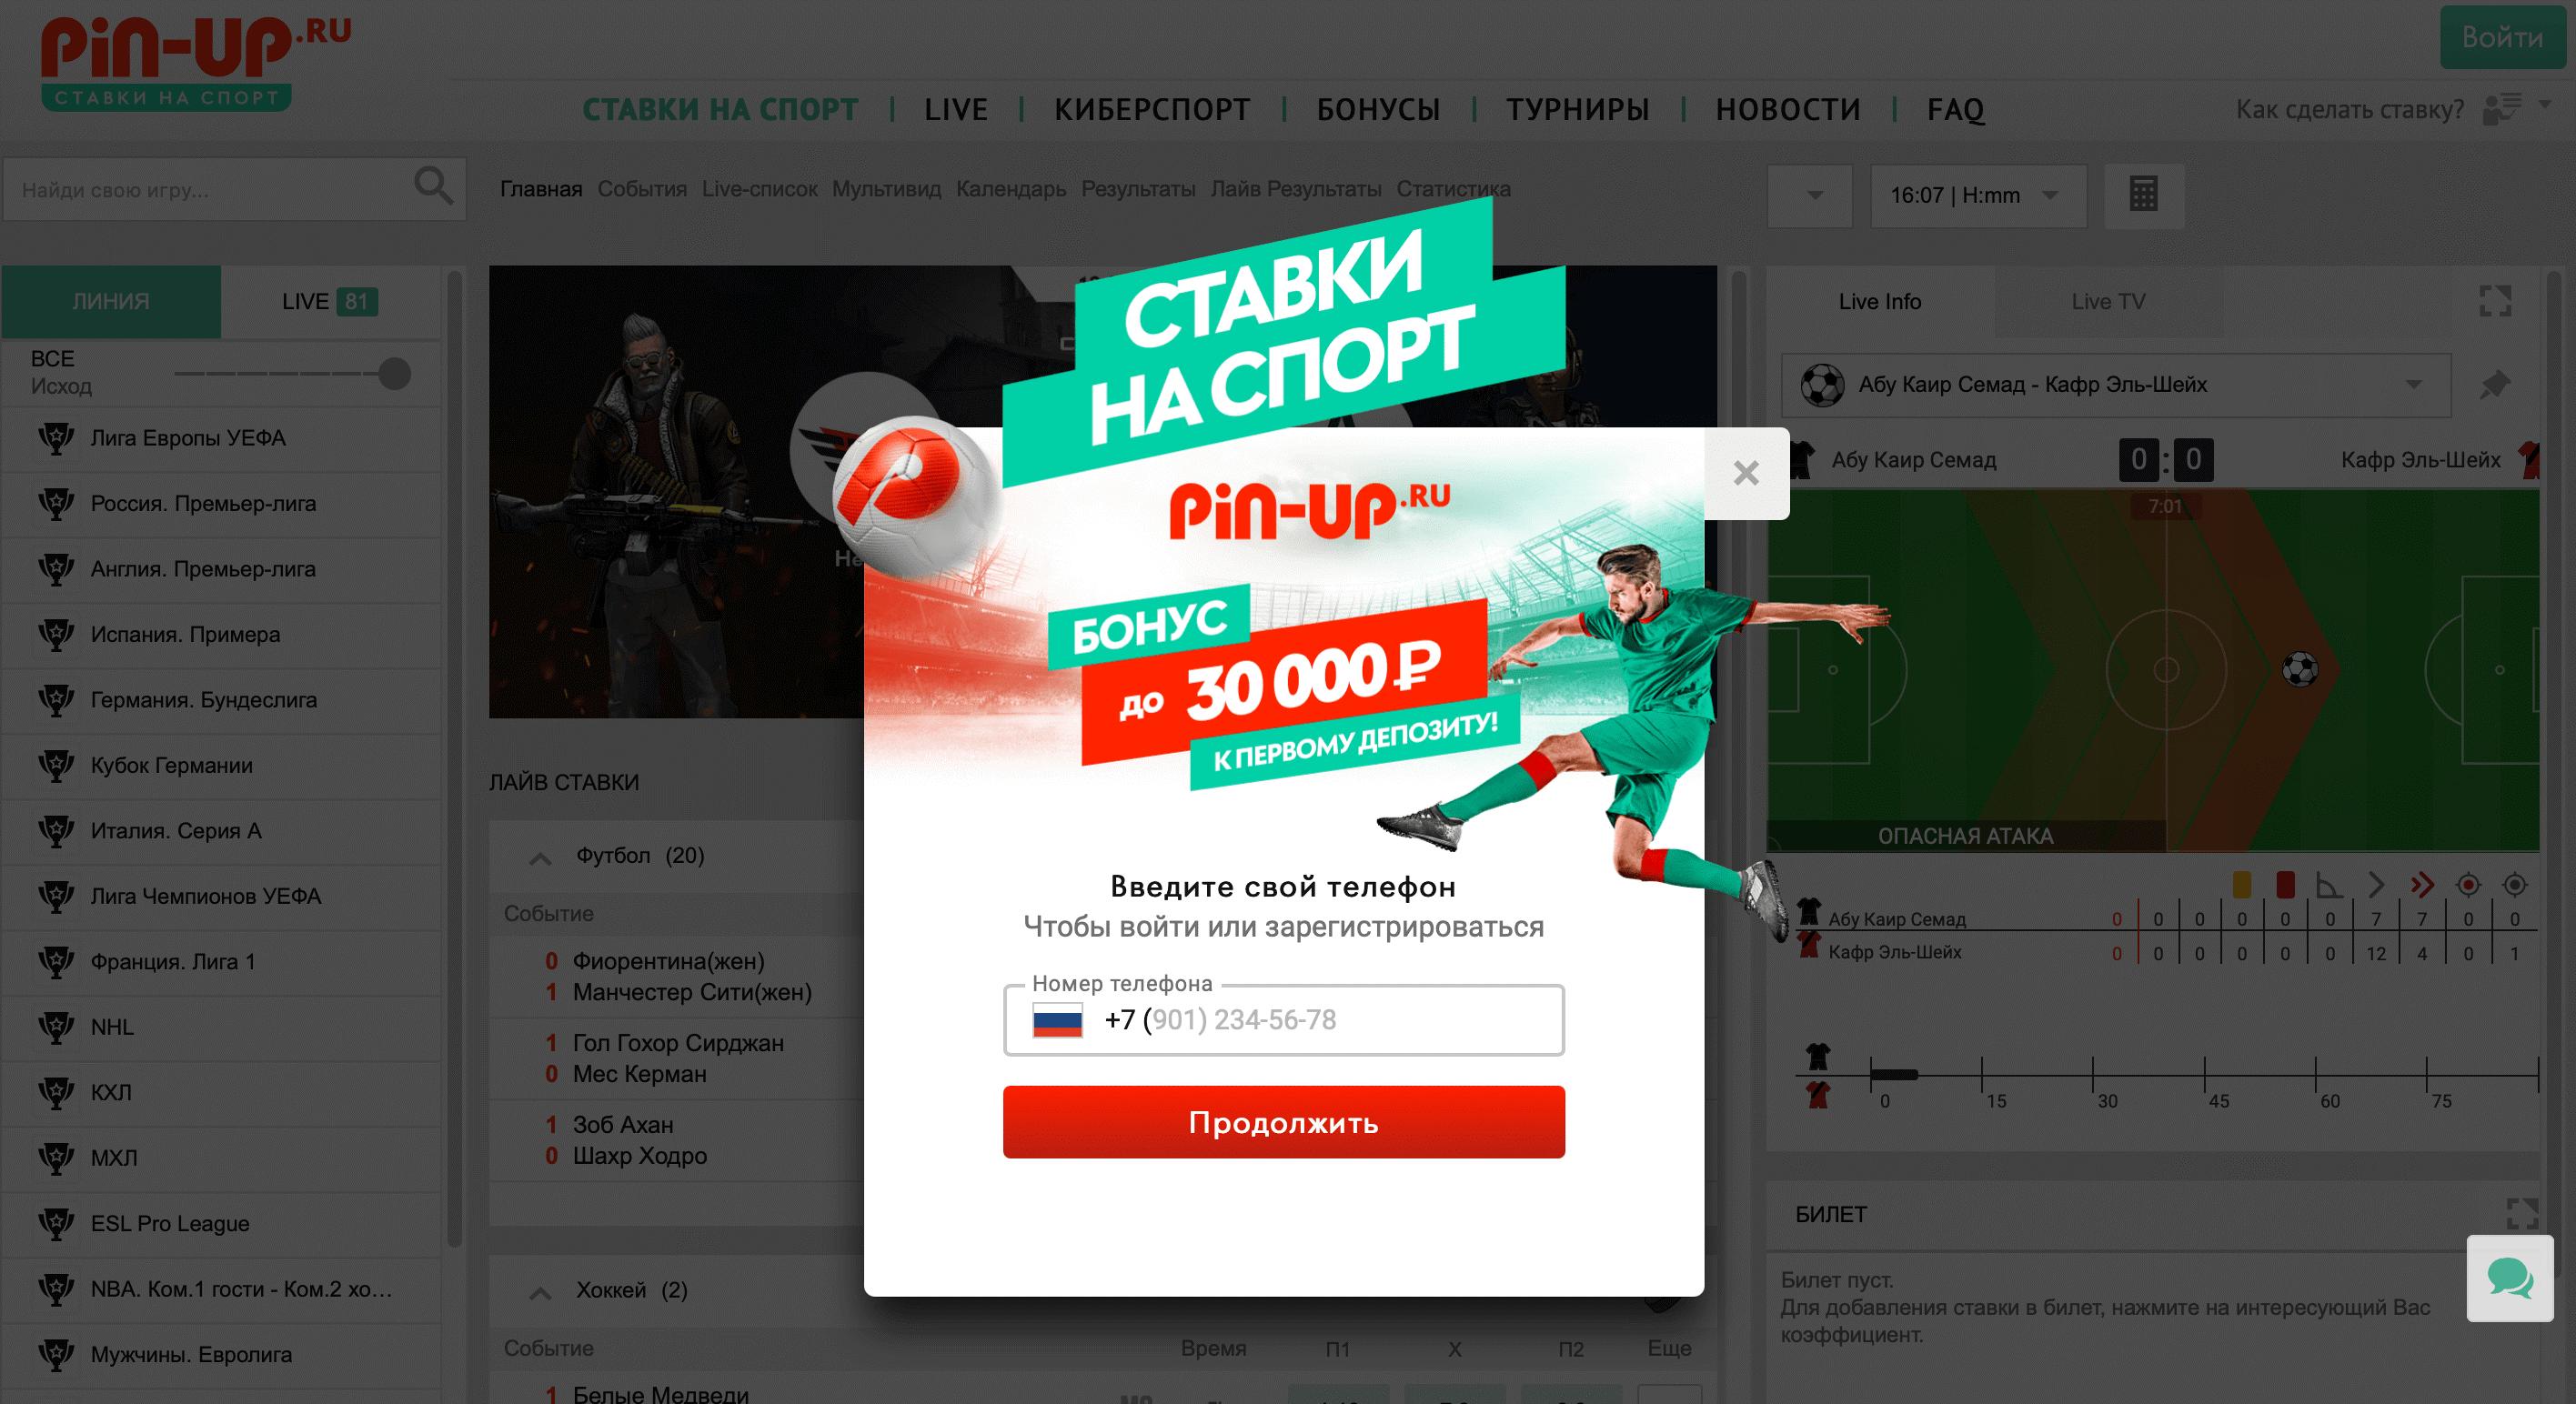 Регистрация БК «Pin UP ru»